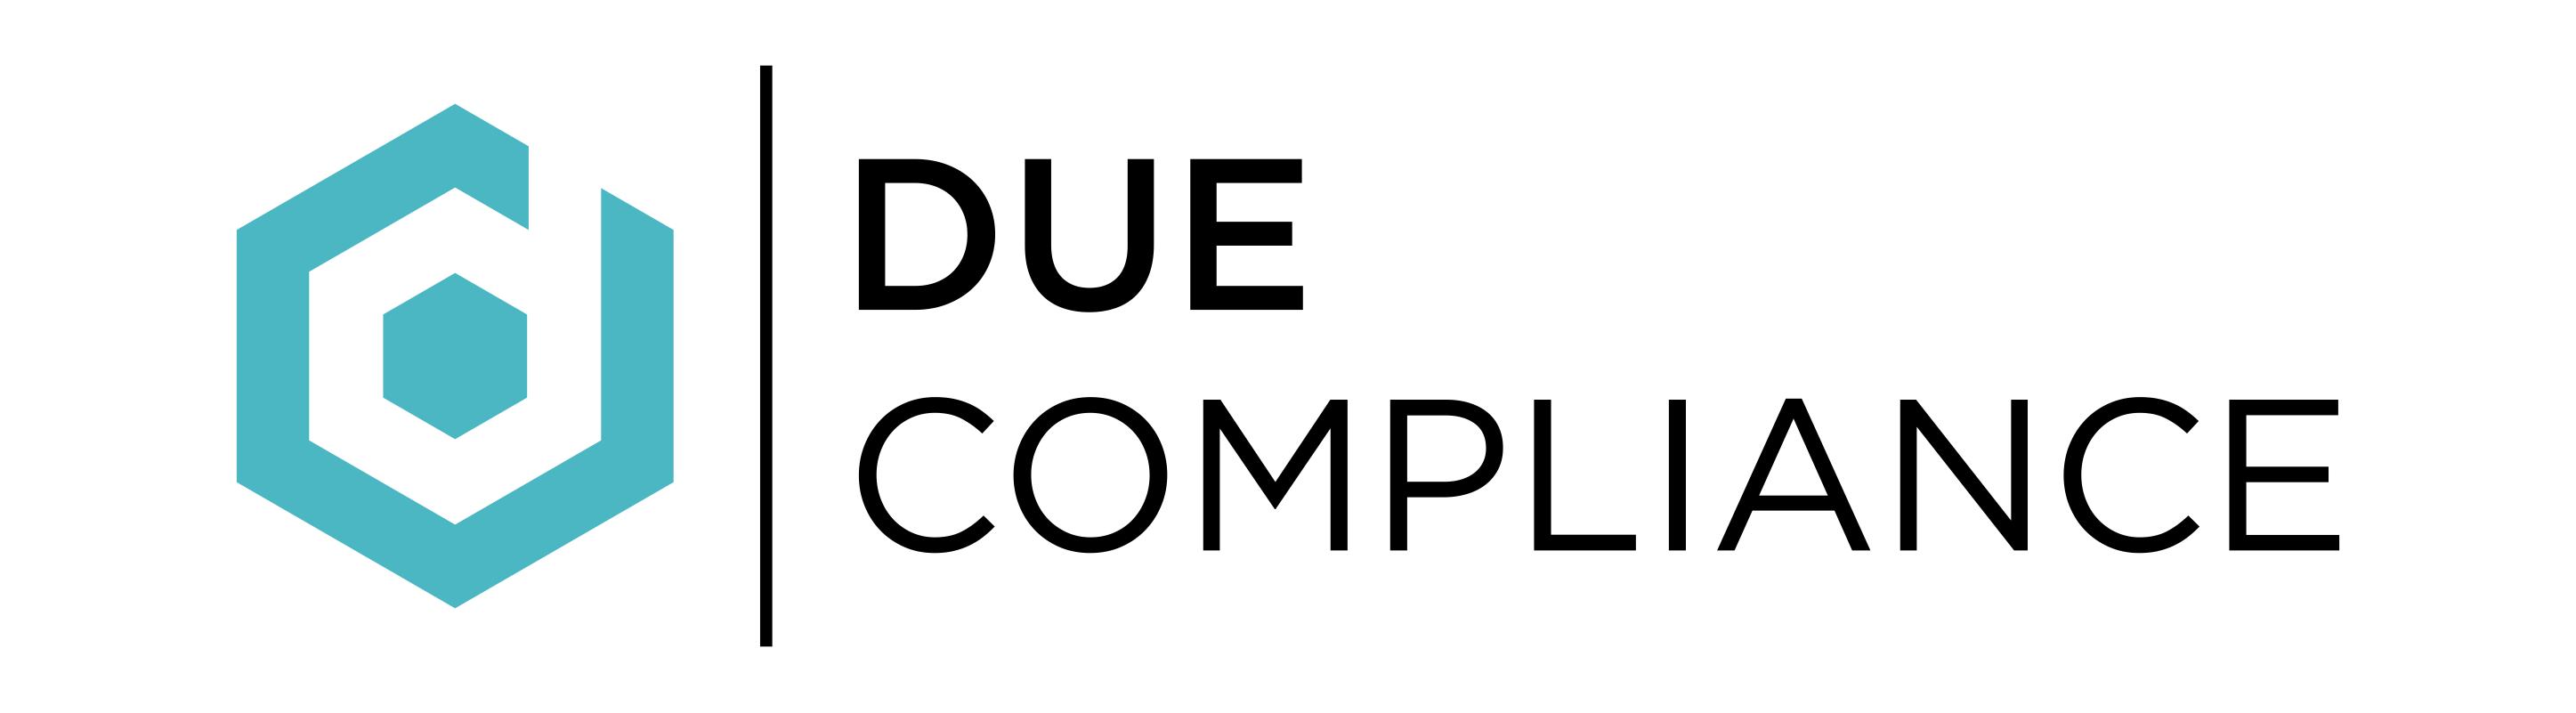 Due Compliance Training